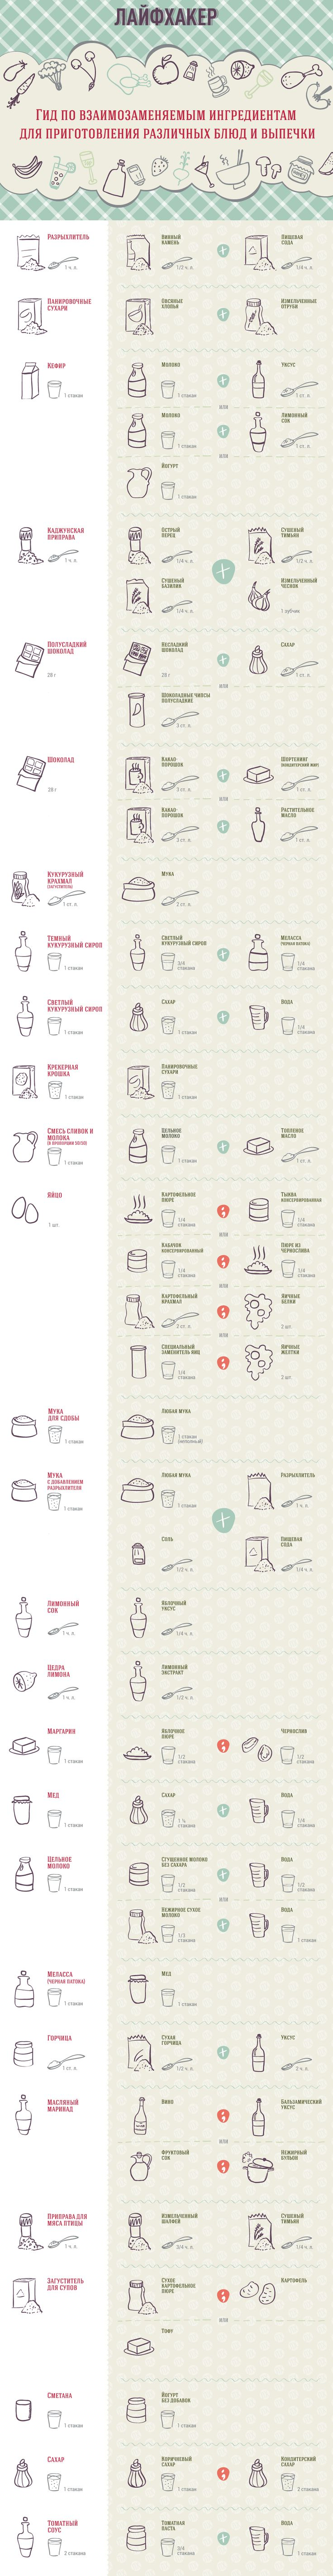 #лайфхак #lifehack #инфографика #infographics #питание #здоровье #еда  #food #health #food